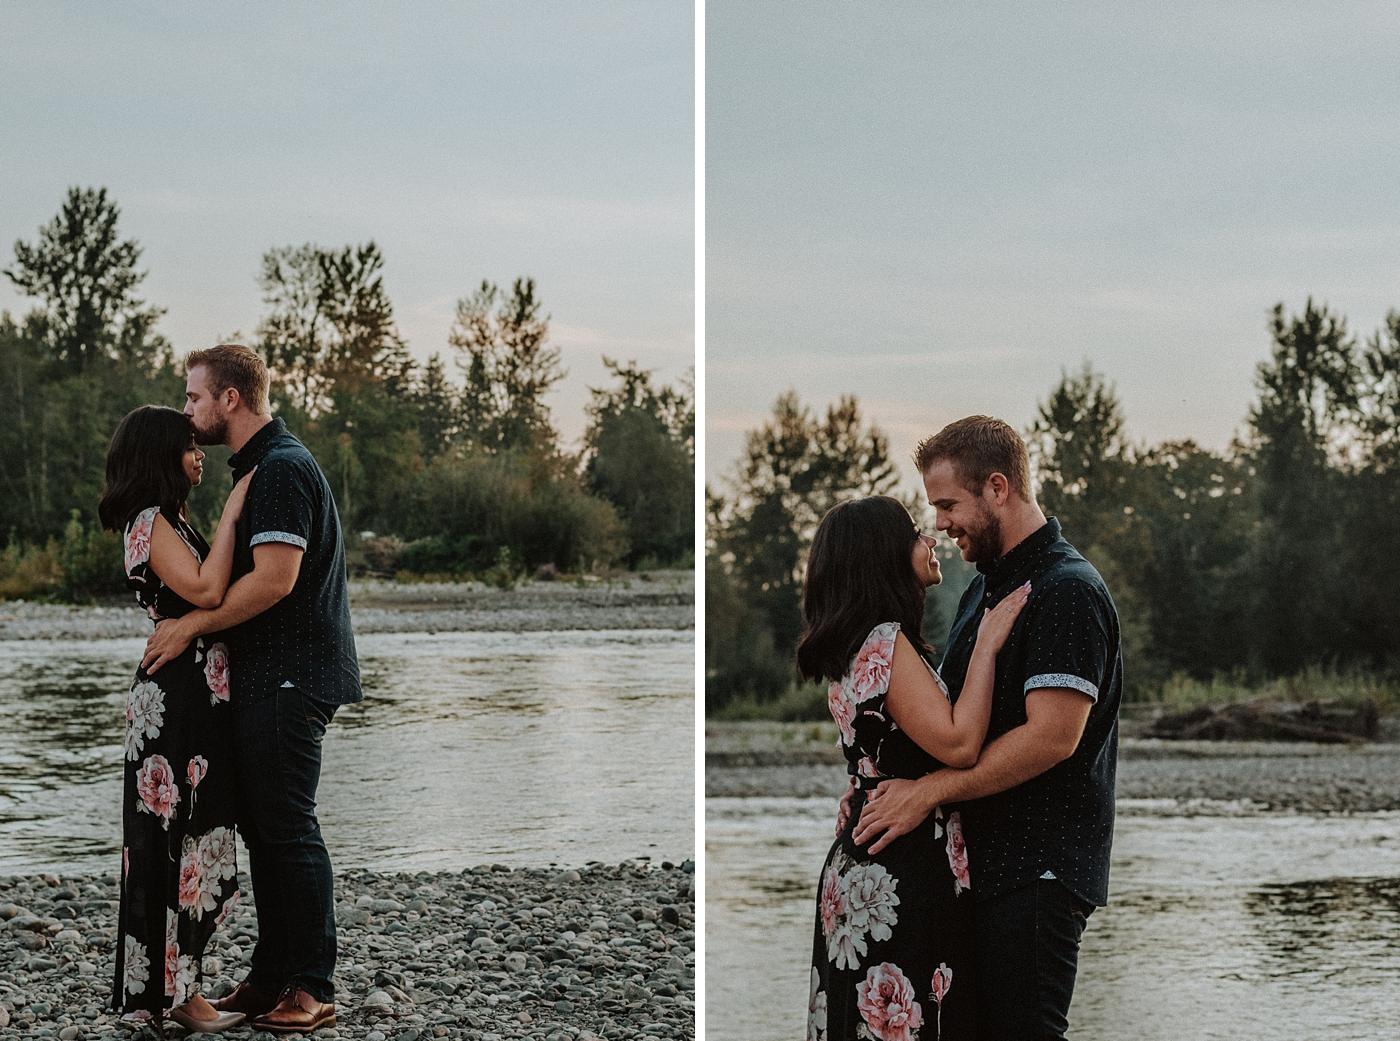 Romantic-Greenery-Engagement-Photography_0011.jpg